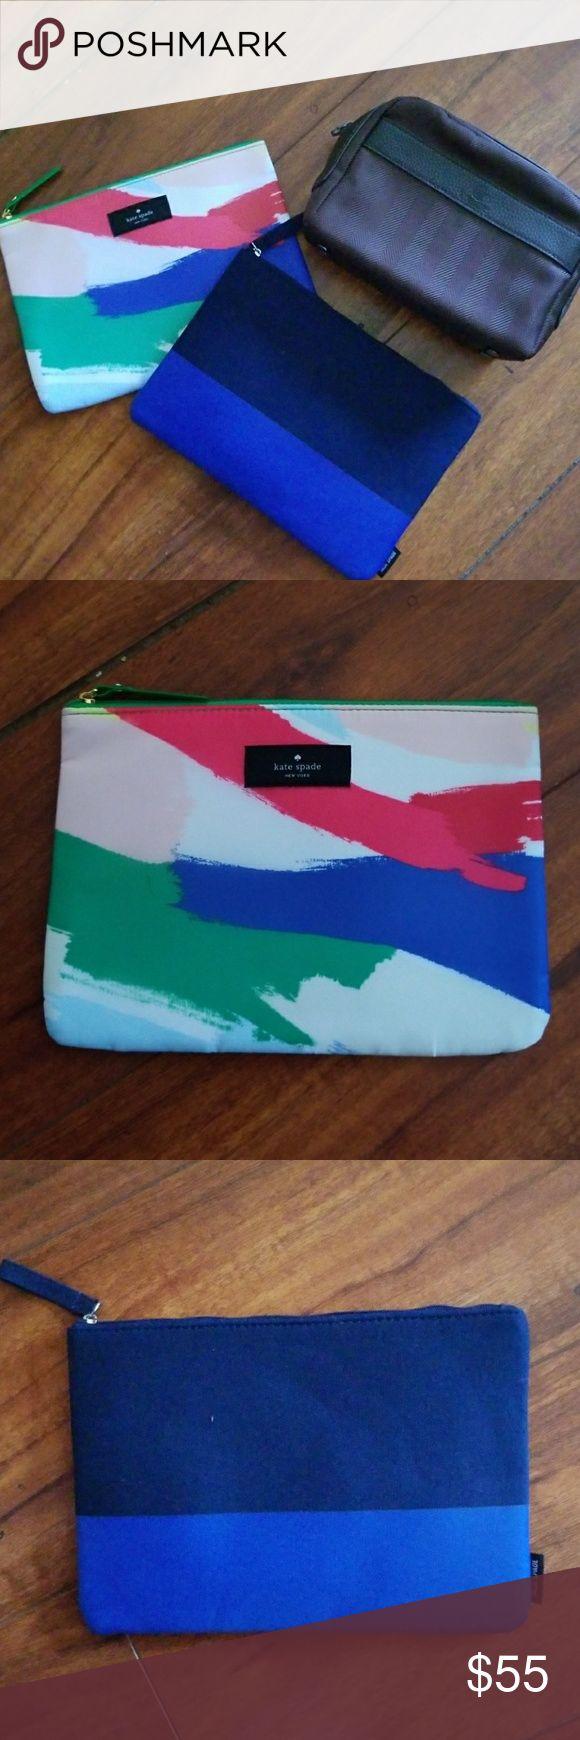 Kate Spade, Jack Spade & BVLGARI Bag Bundle 3 pcs all new signature pouch! kate spade Bags